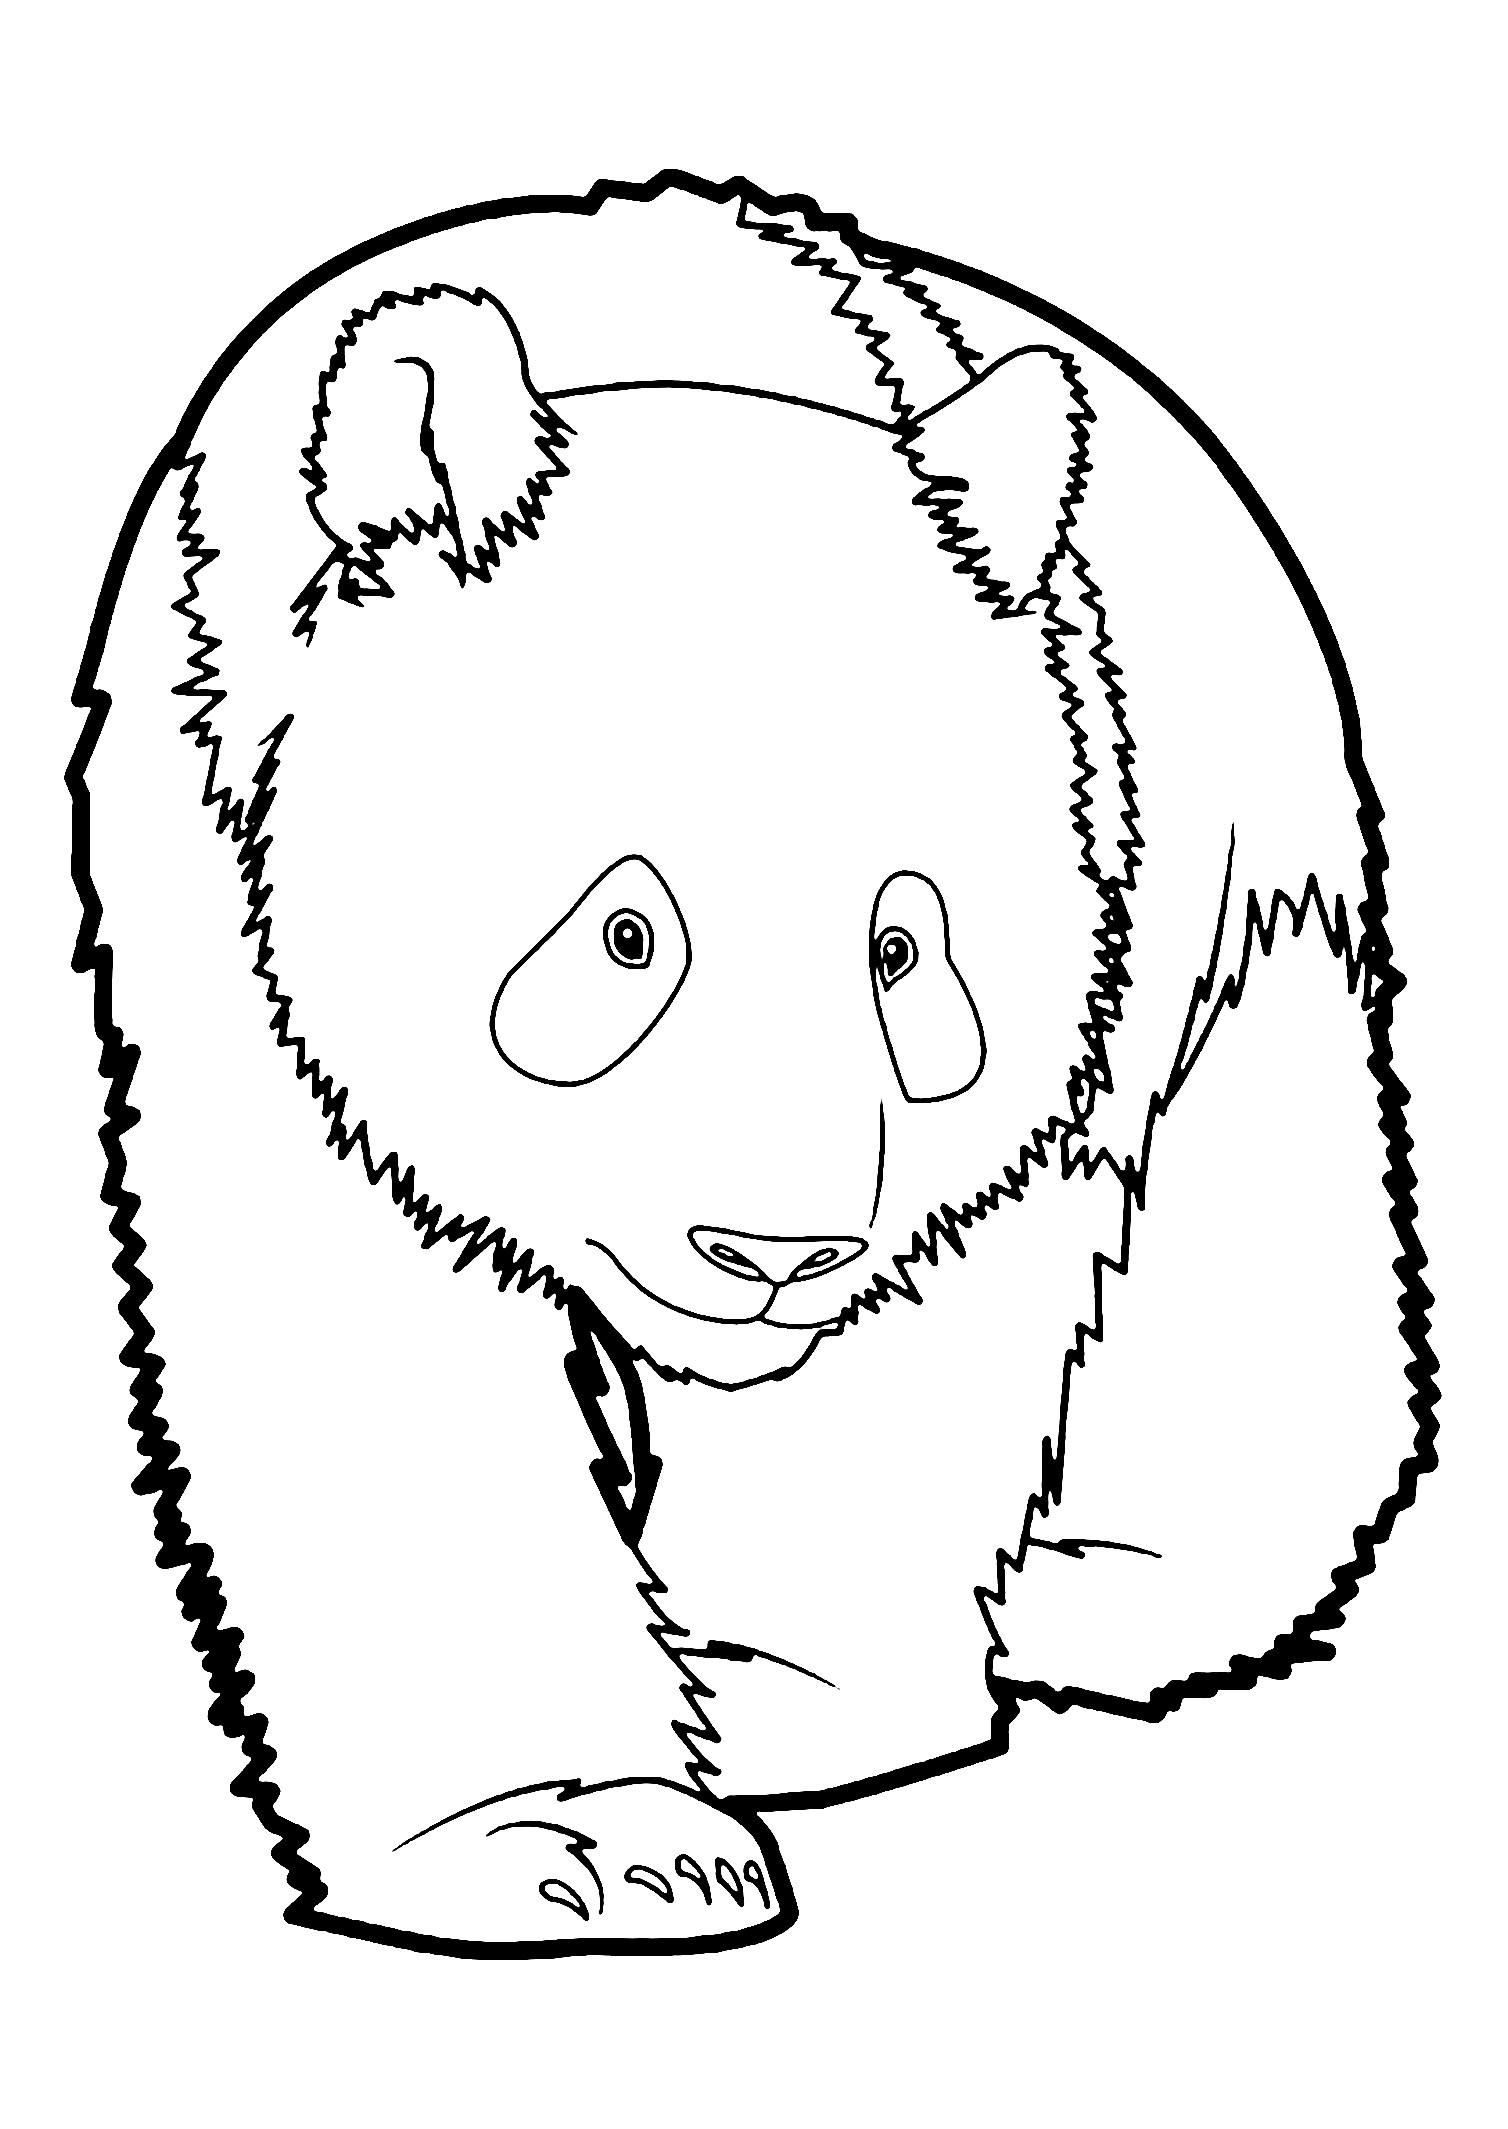 Pandas to print for free - Pandas Kids Coloring Pages